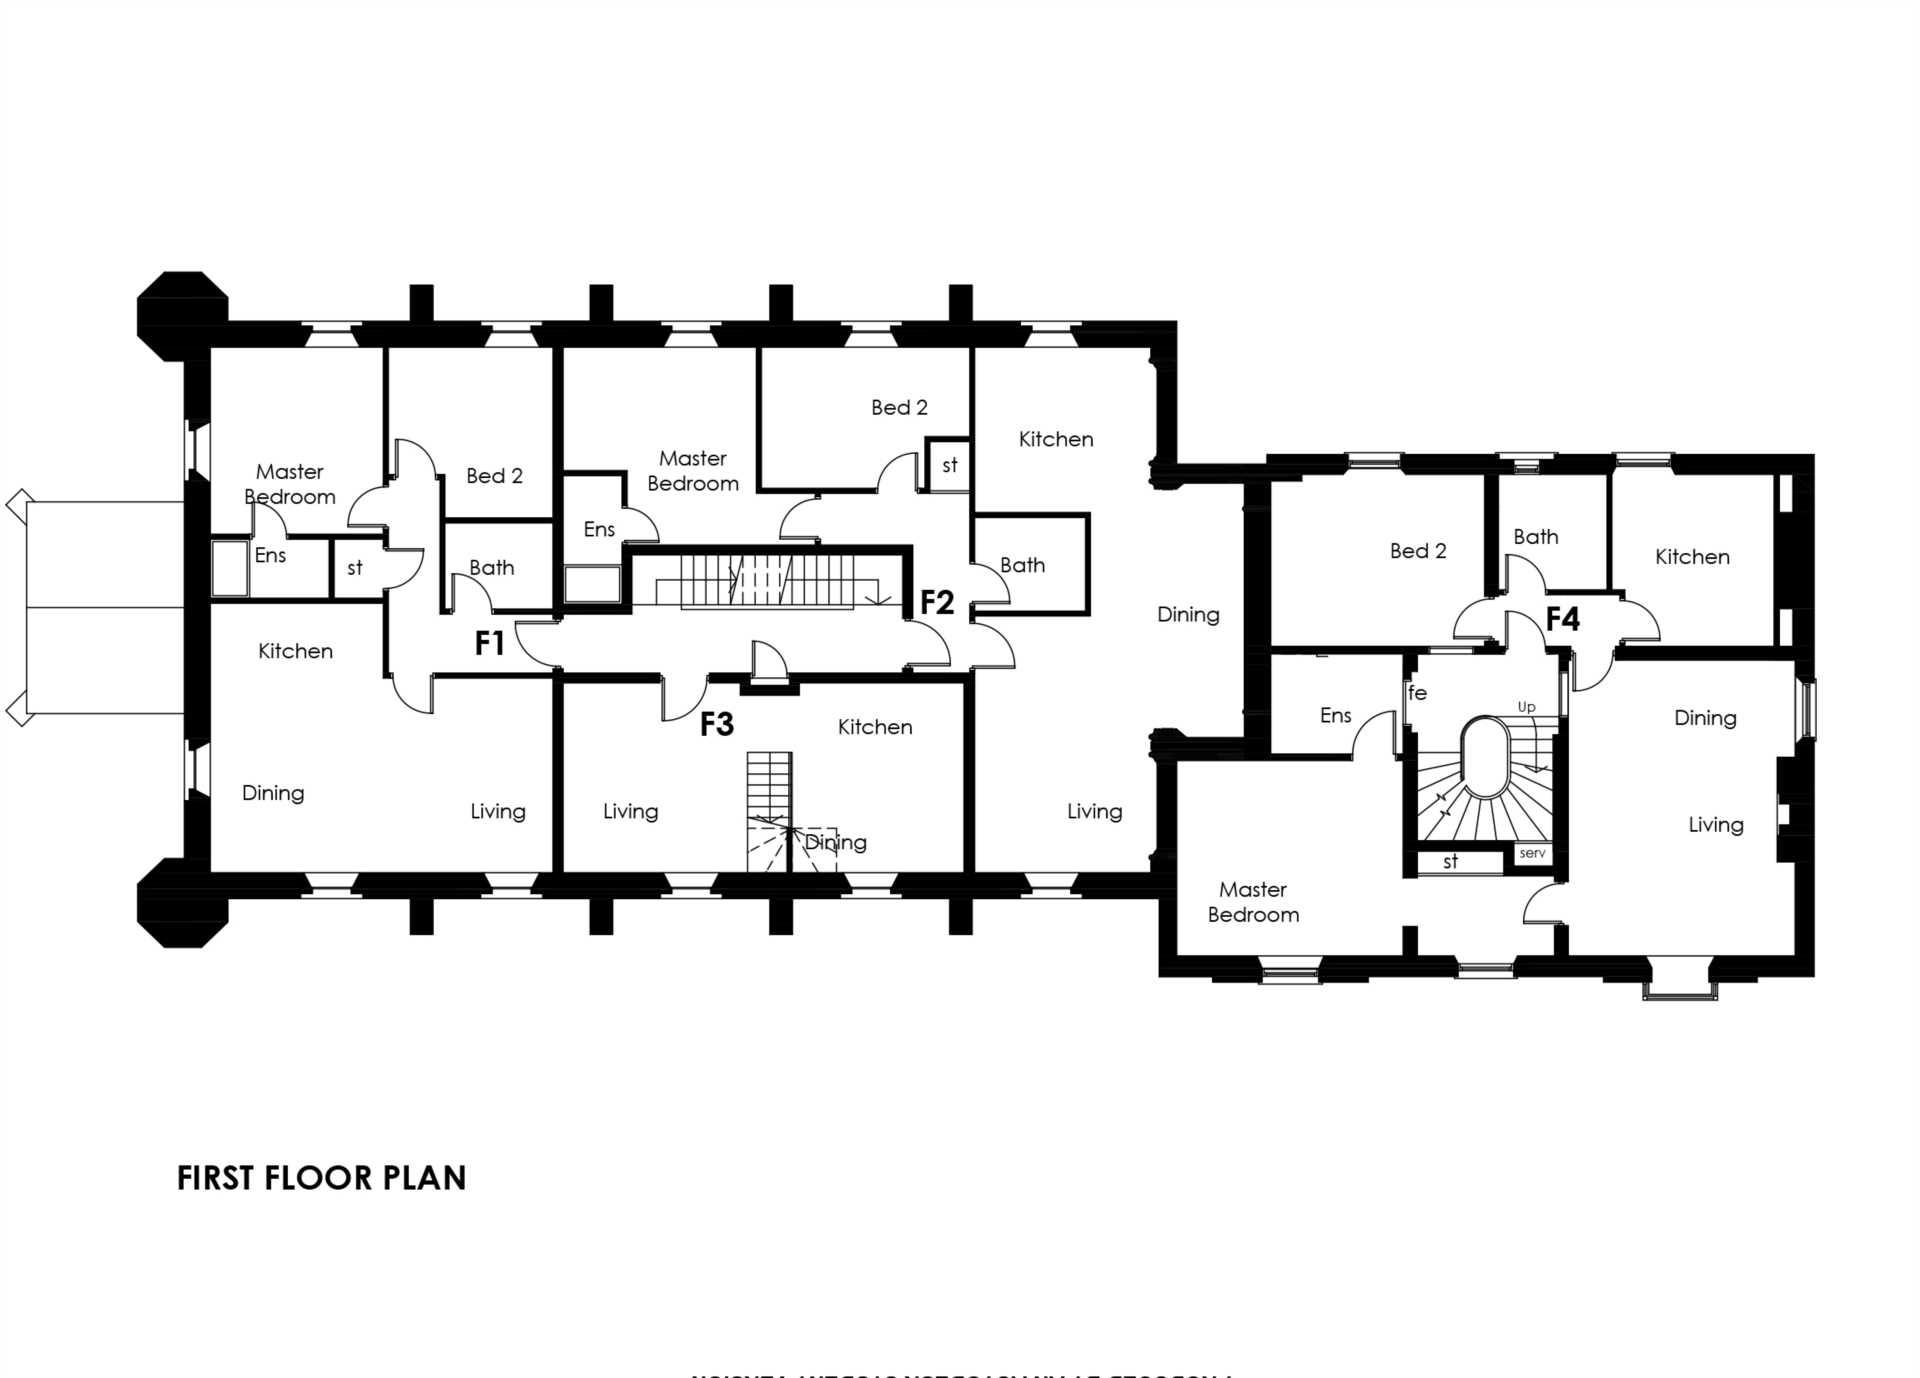 St Austins Development - Grassendale, Image 10